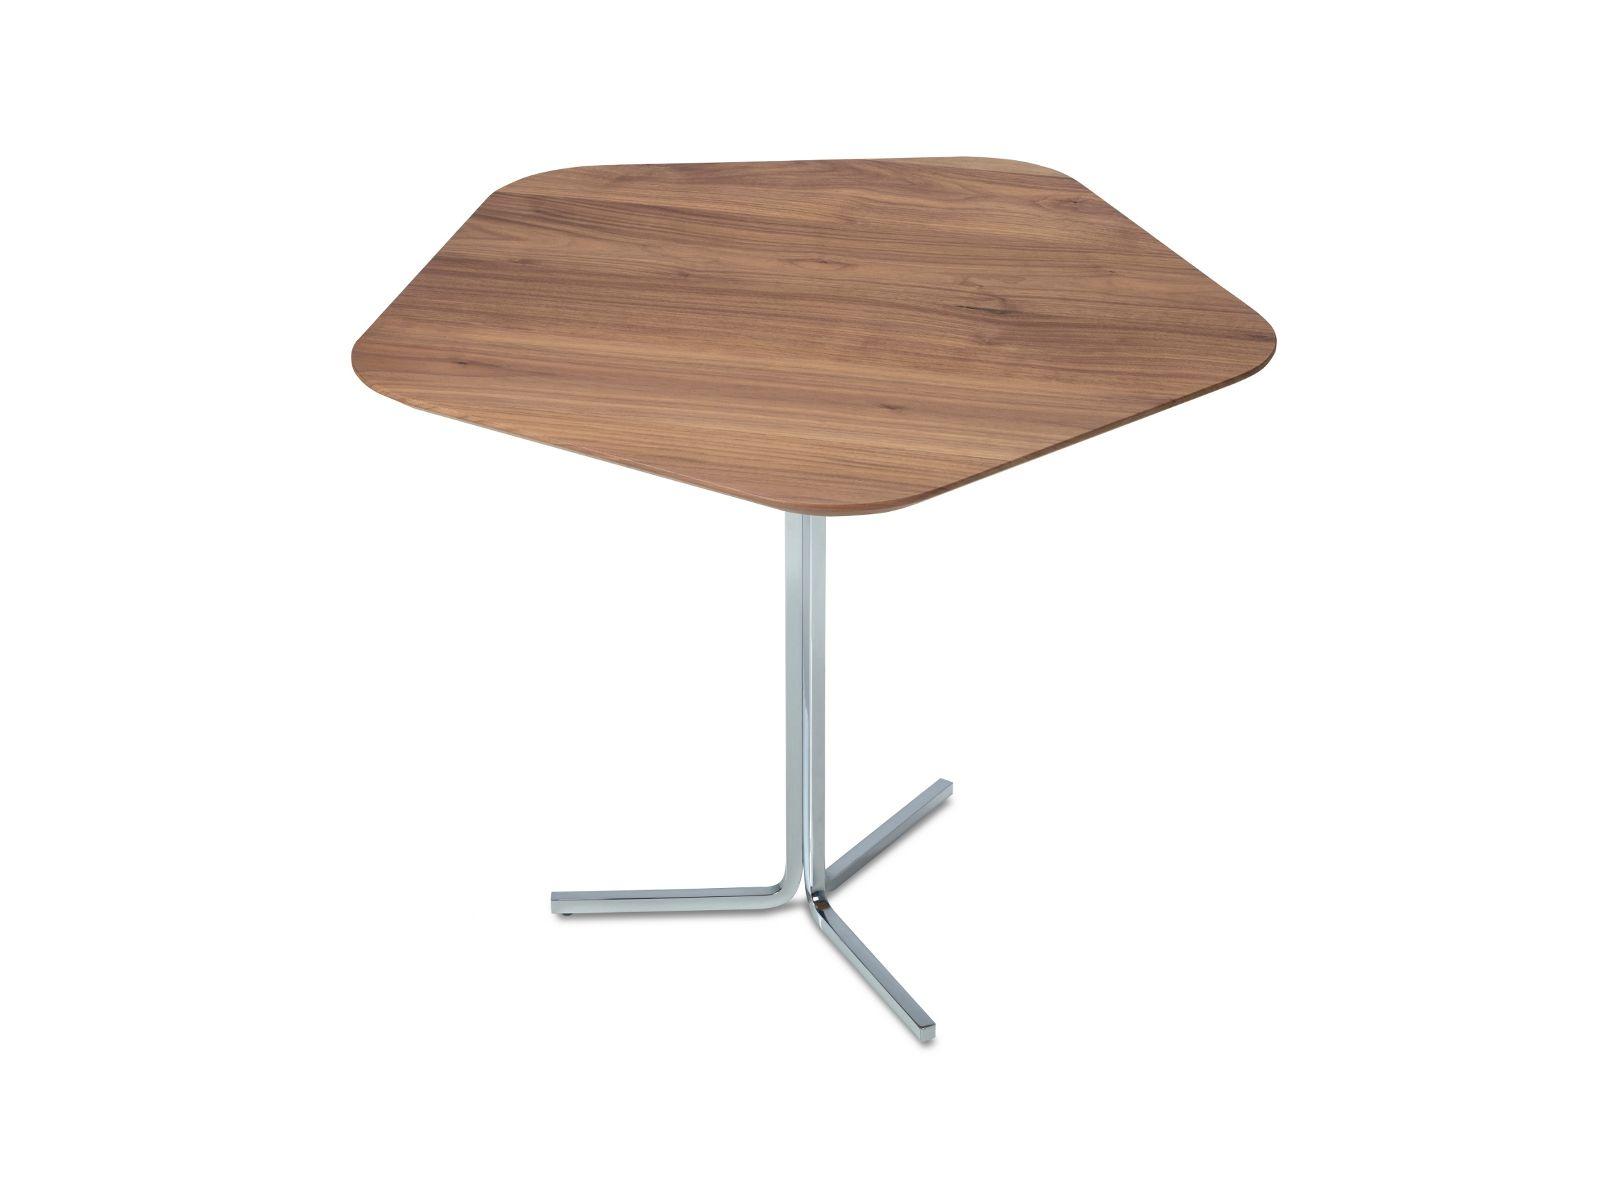 Home 3d Design Software Pentagono Side Table Pentagono Collection By Jori Design